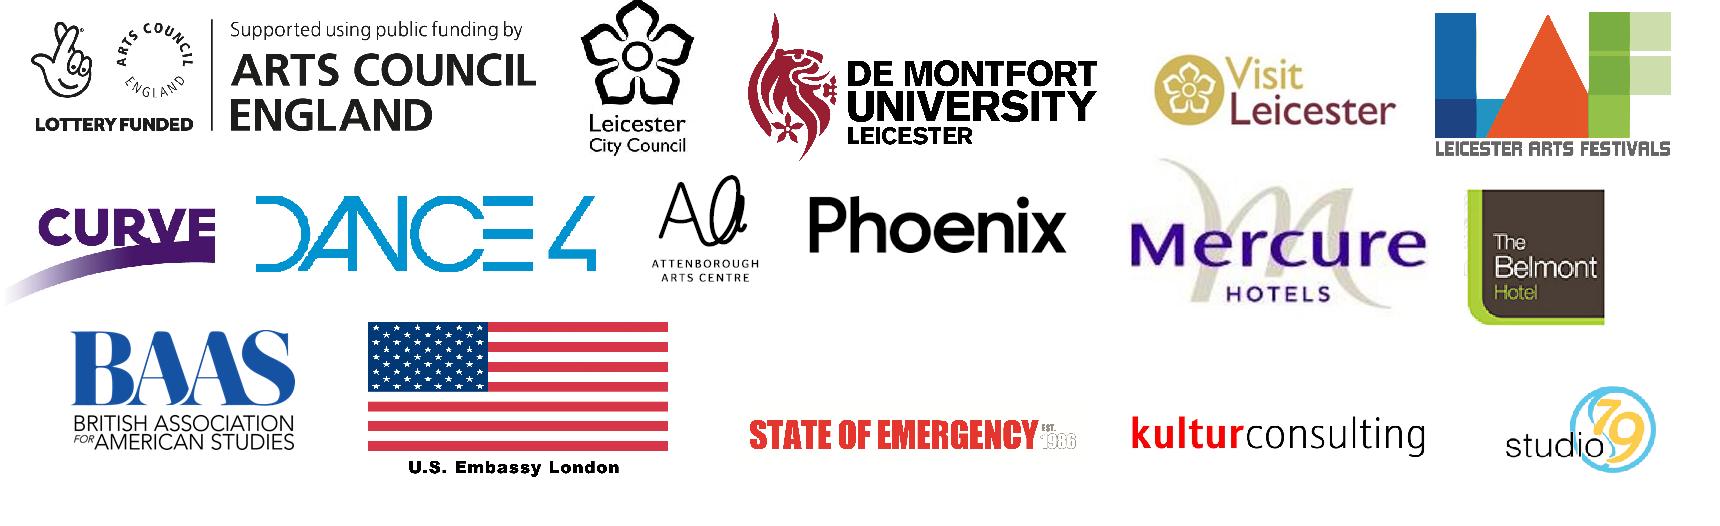 ALL LDIF17 Logos